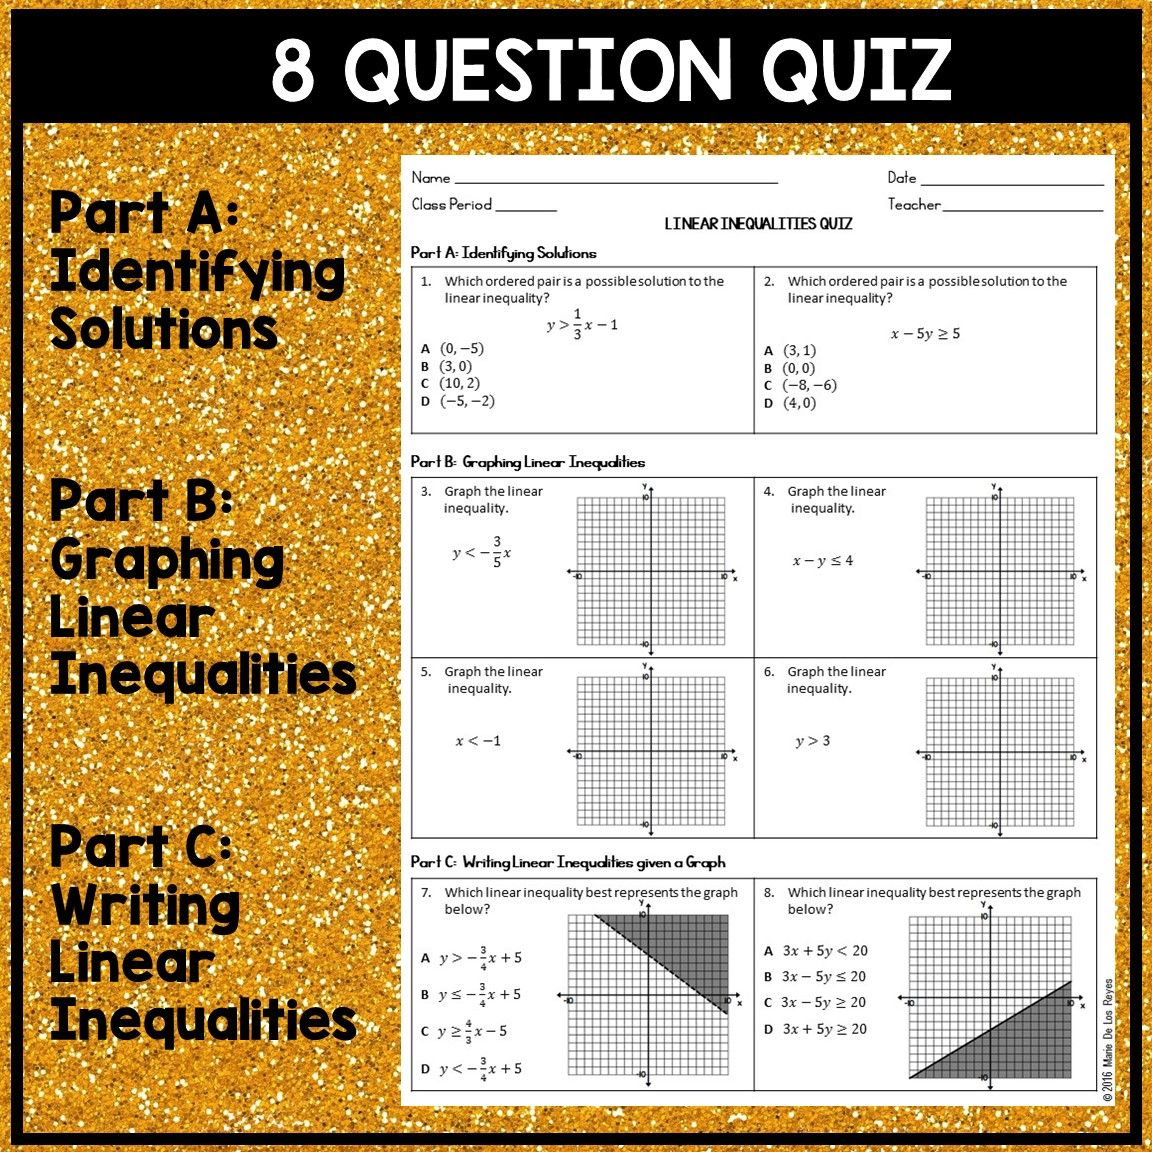 Linear Inequalities QUIZ Graphing linear inequalities